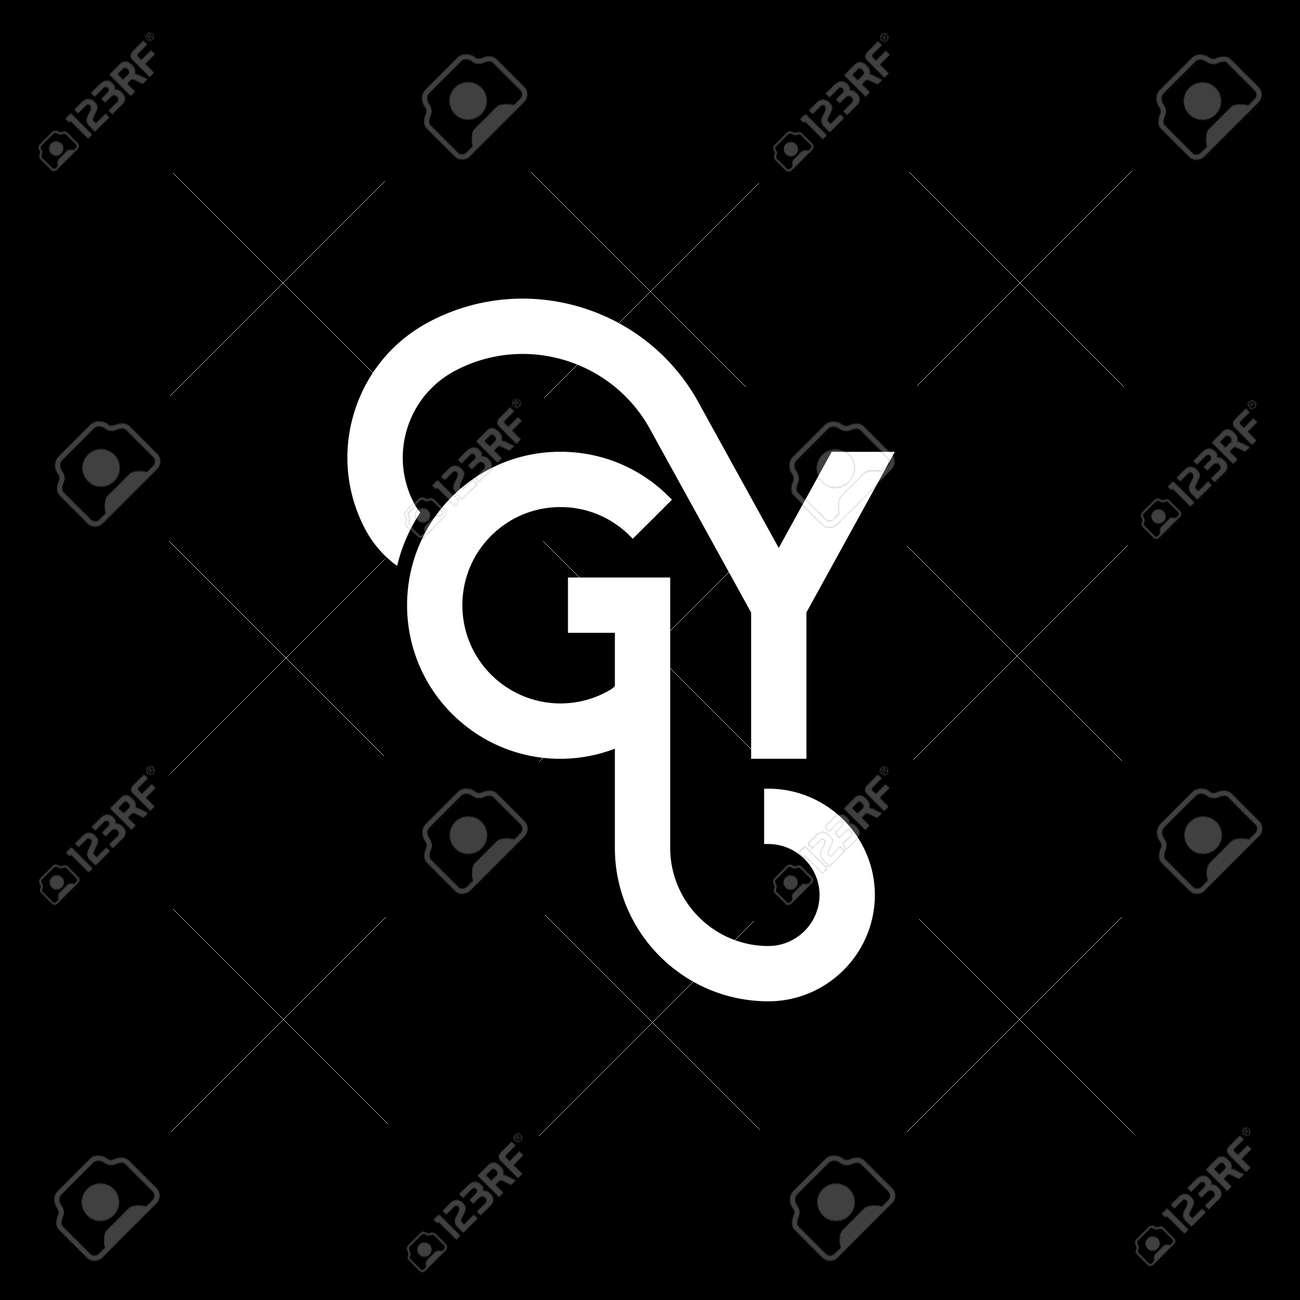 GY letter design on black background. - 165180728